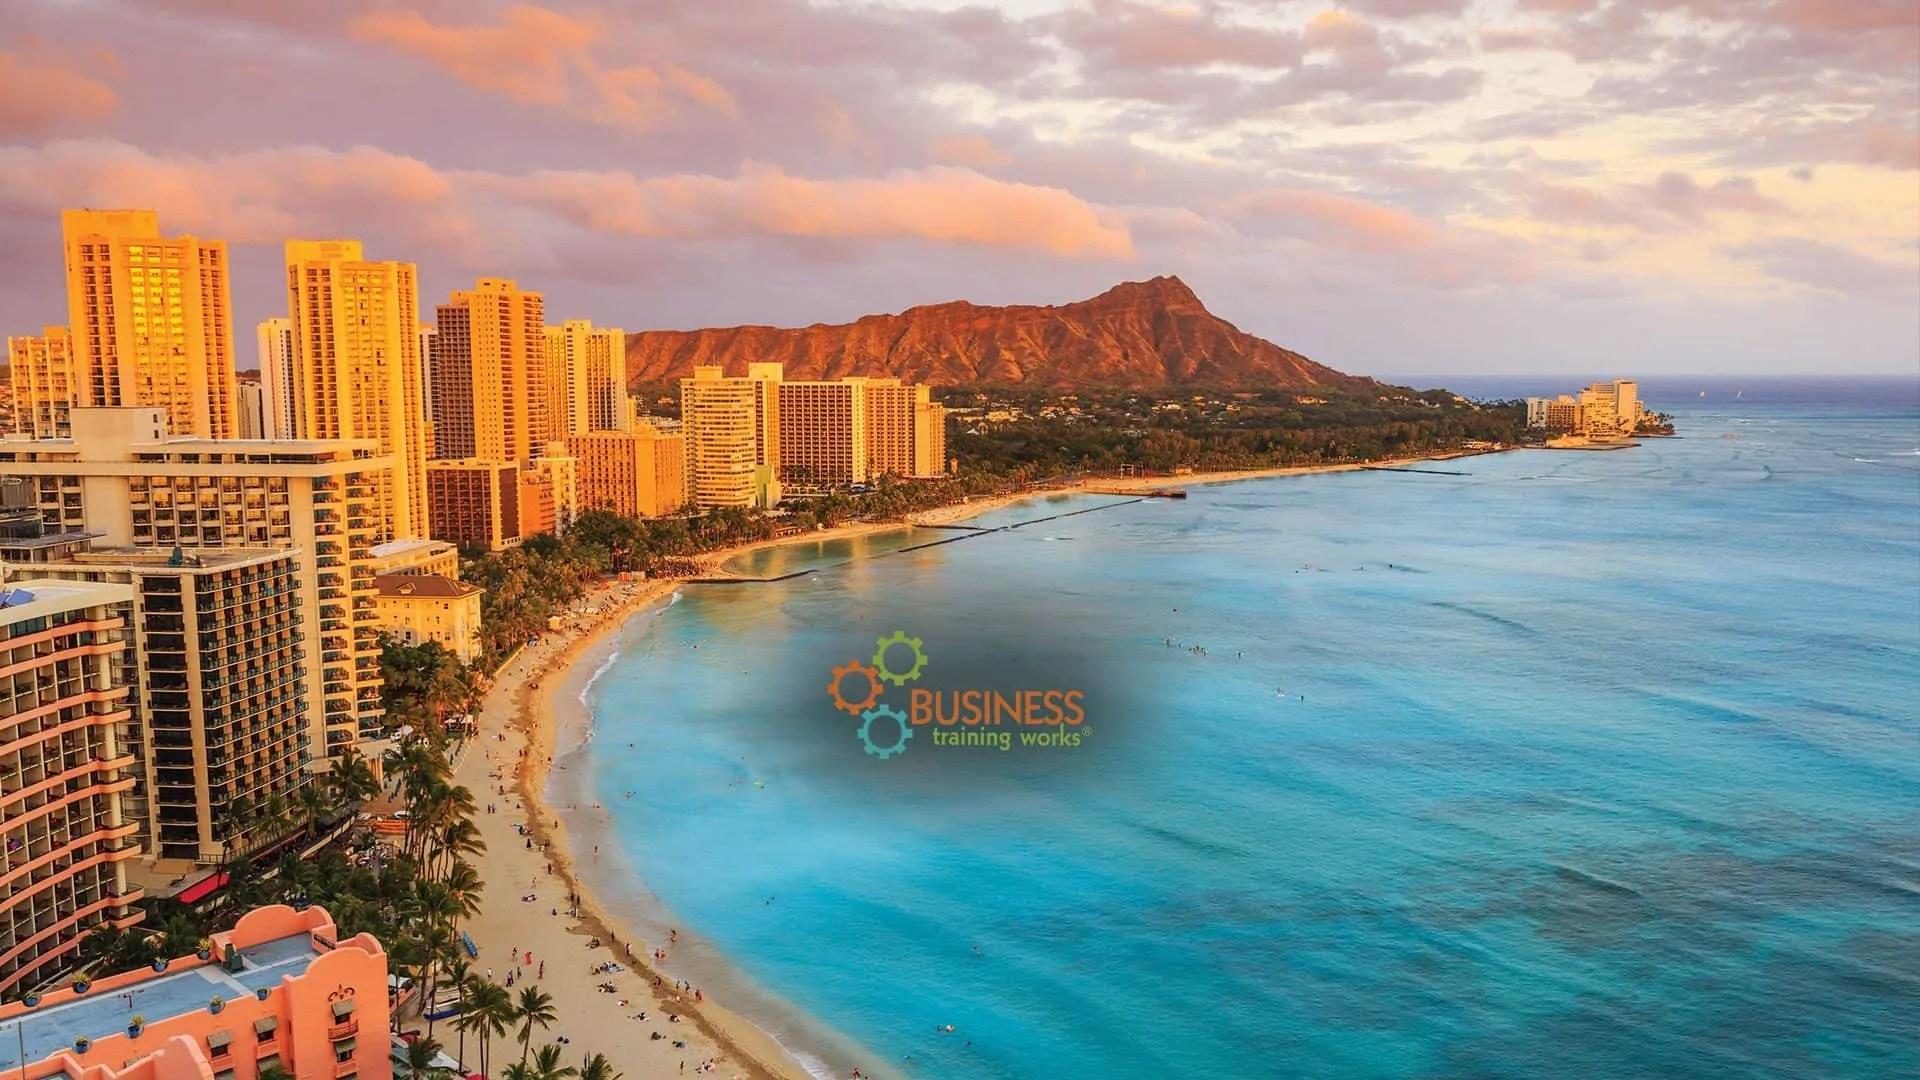 Onsite Training in Hawaii